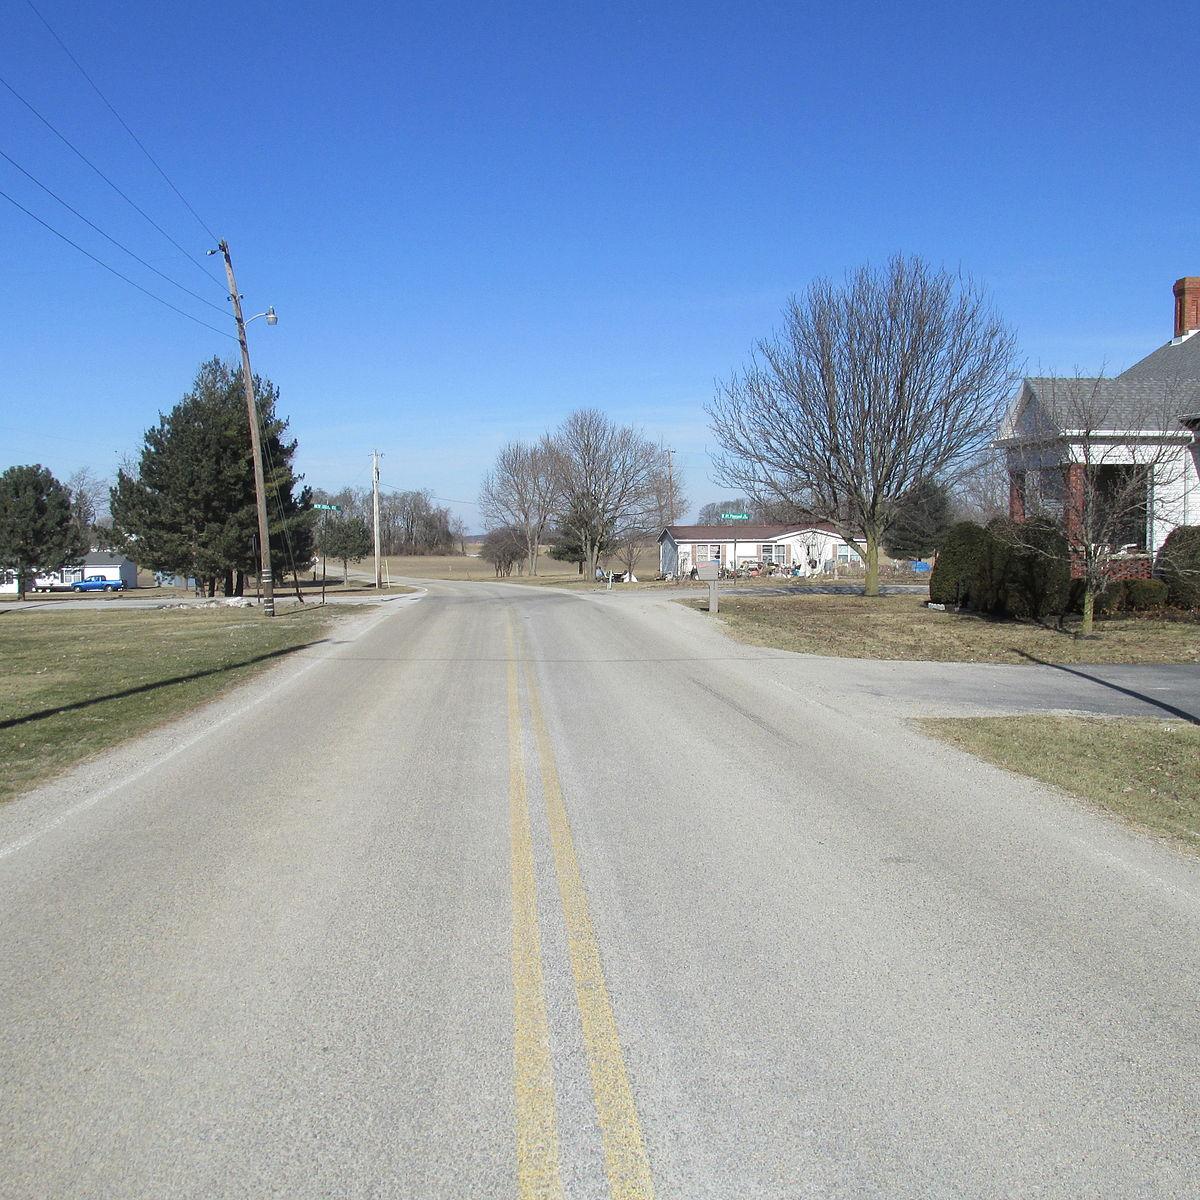 Ohio clinton county midland - Ohio Clinton County Midland 59